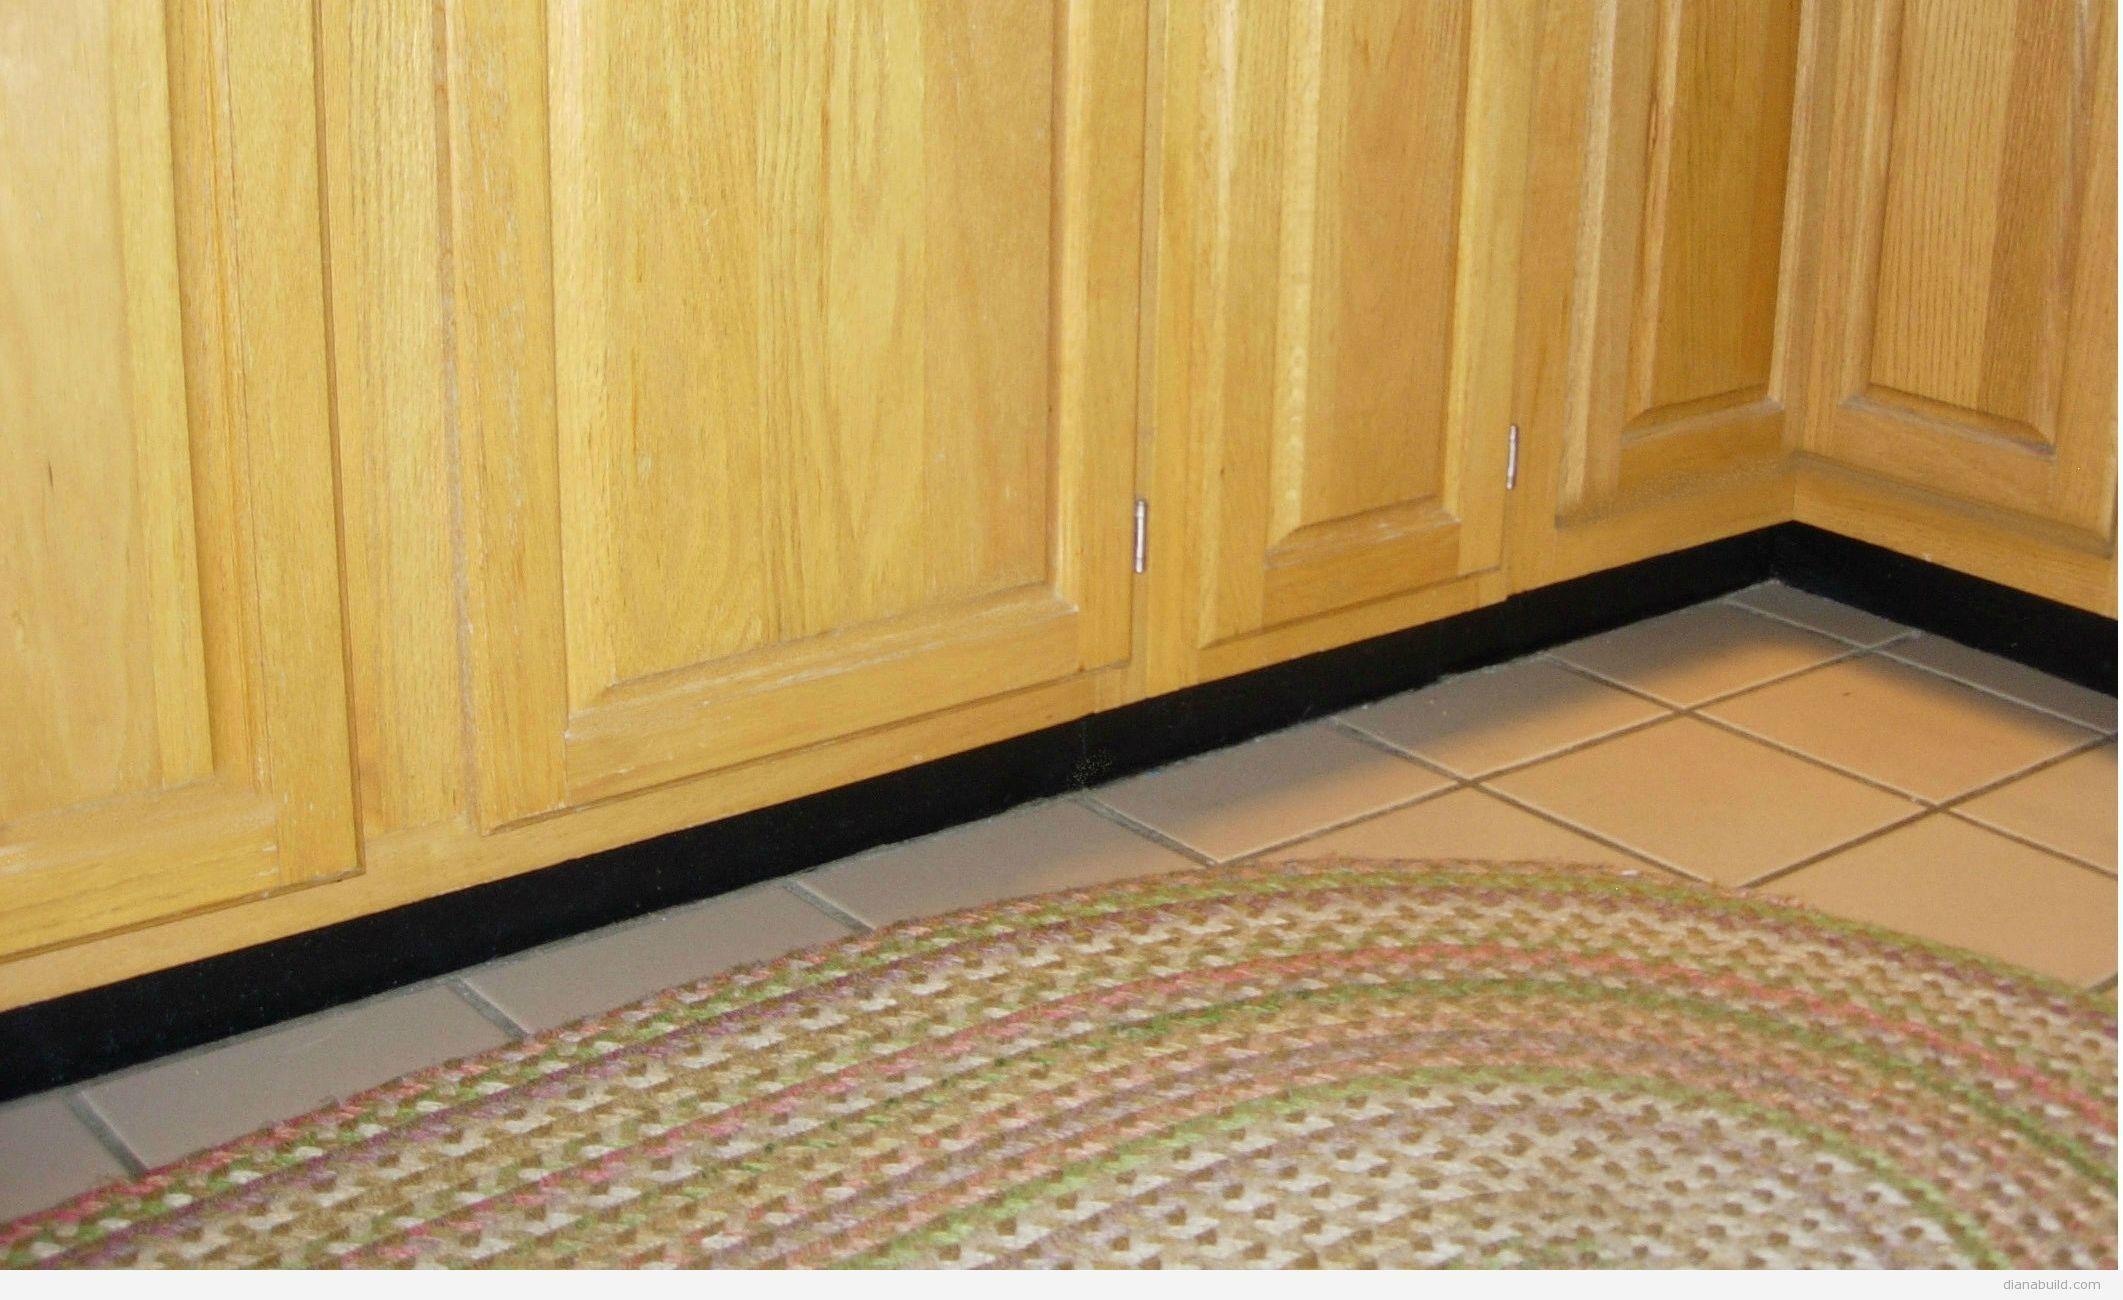 Kitchen Cabinet Toe Kick Plate